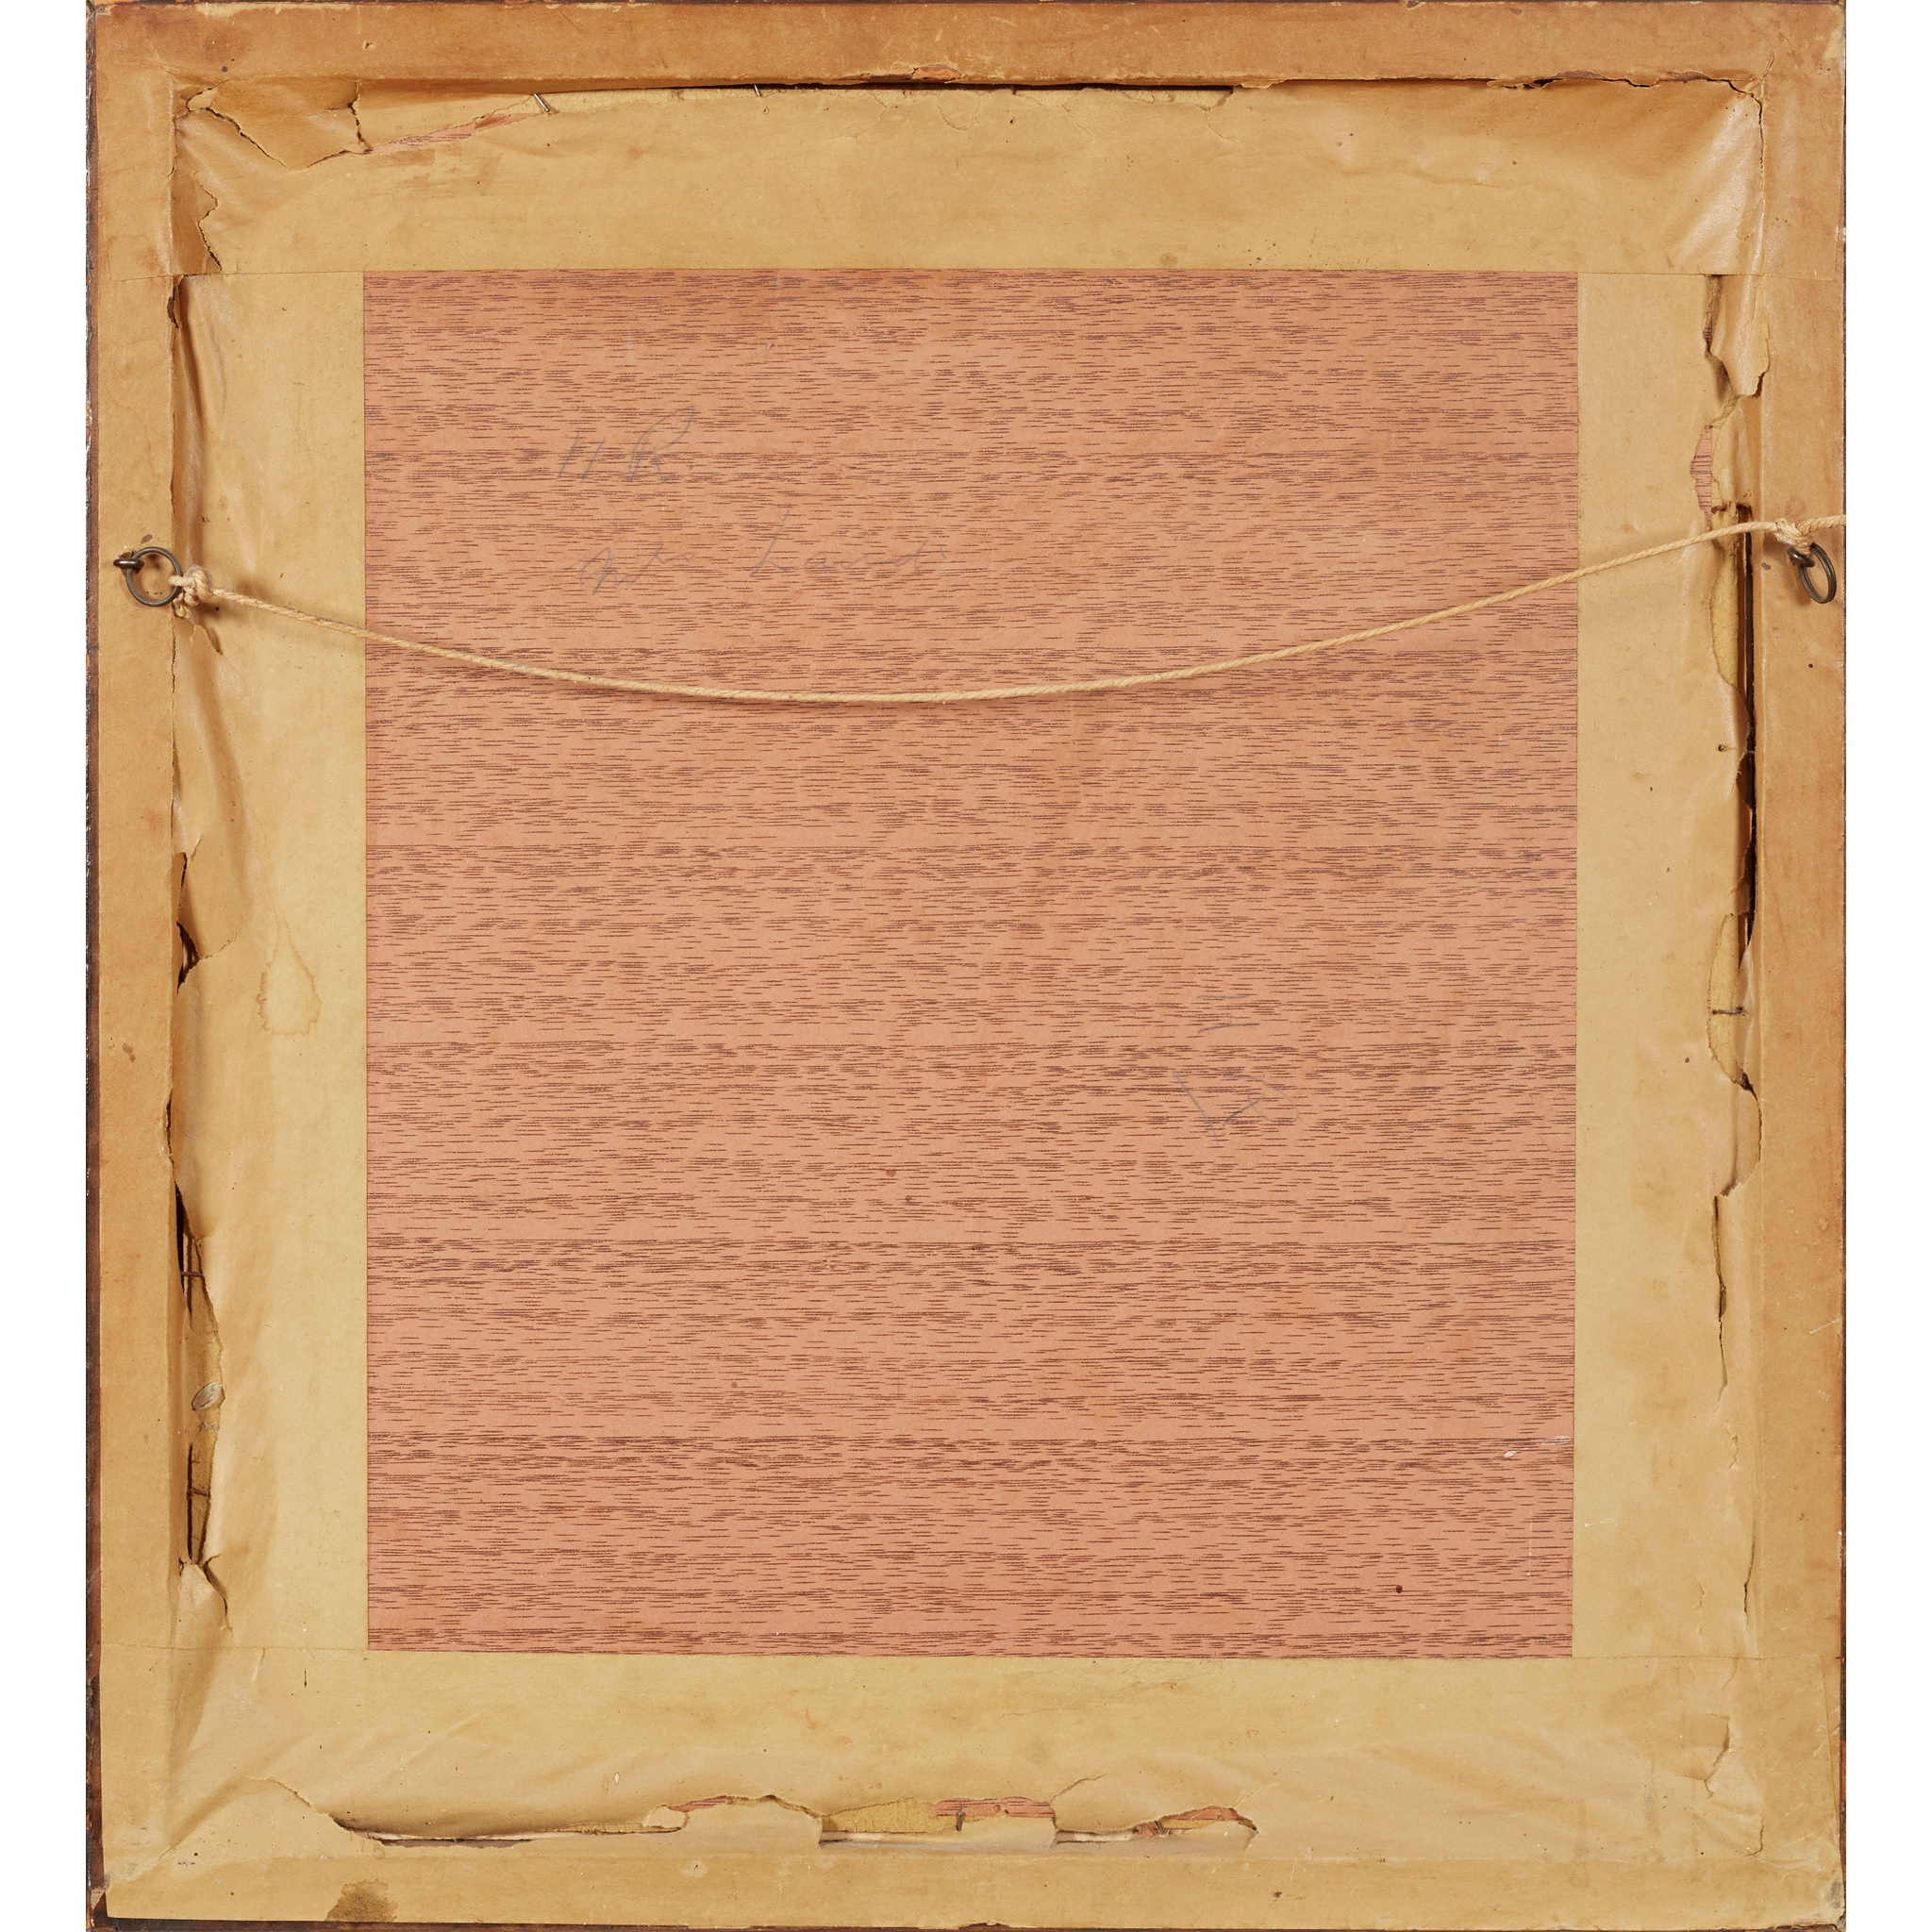 Y A SCOTTISH NEEDLEWORK SAMPLER DATED 1822 - Image 2 of 2